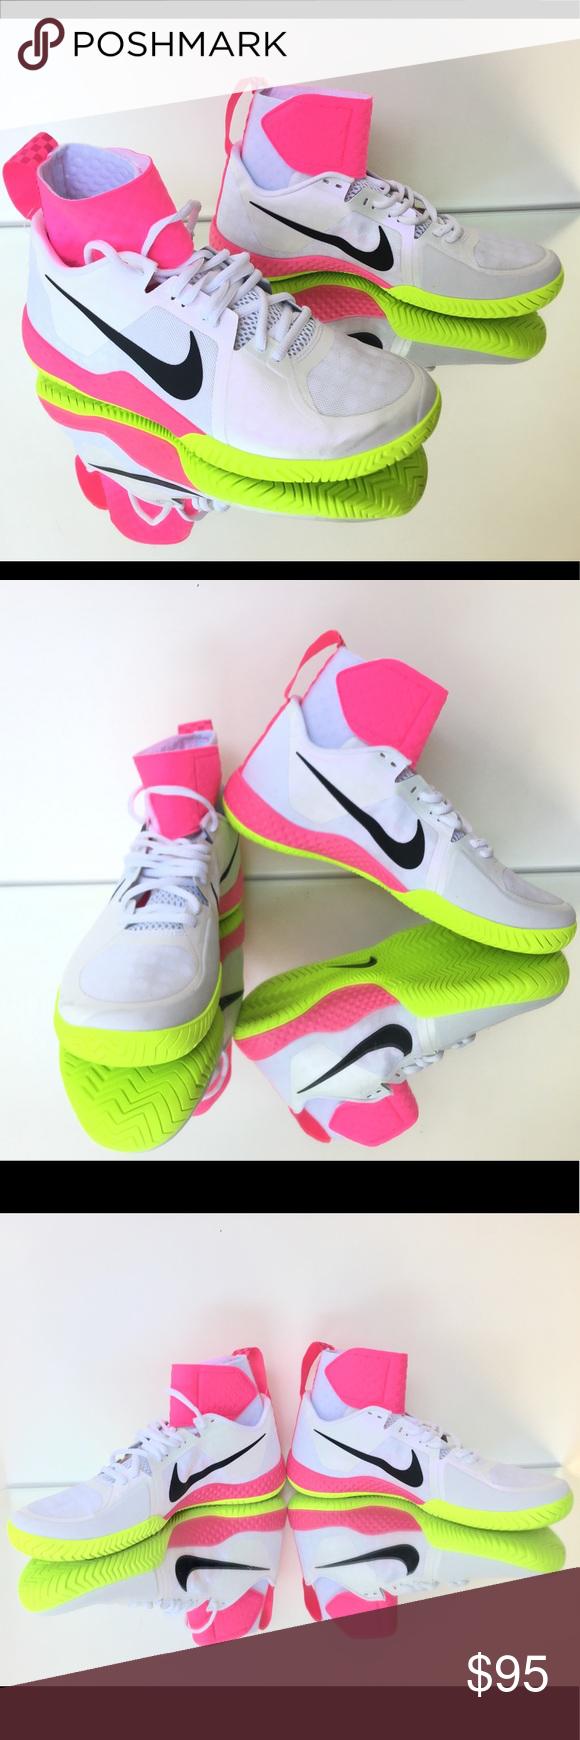 Nike Women S Flare Tennis Shoes Serena Williams Boutique With Images Nike Women Tennis Shoes Nike